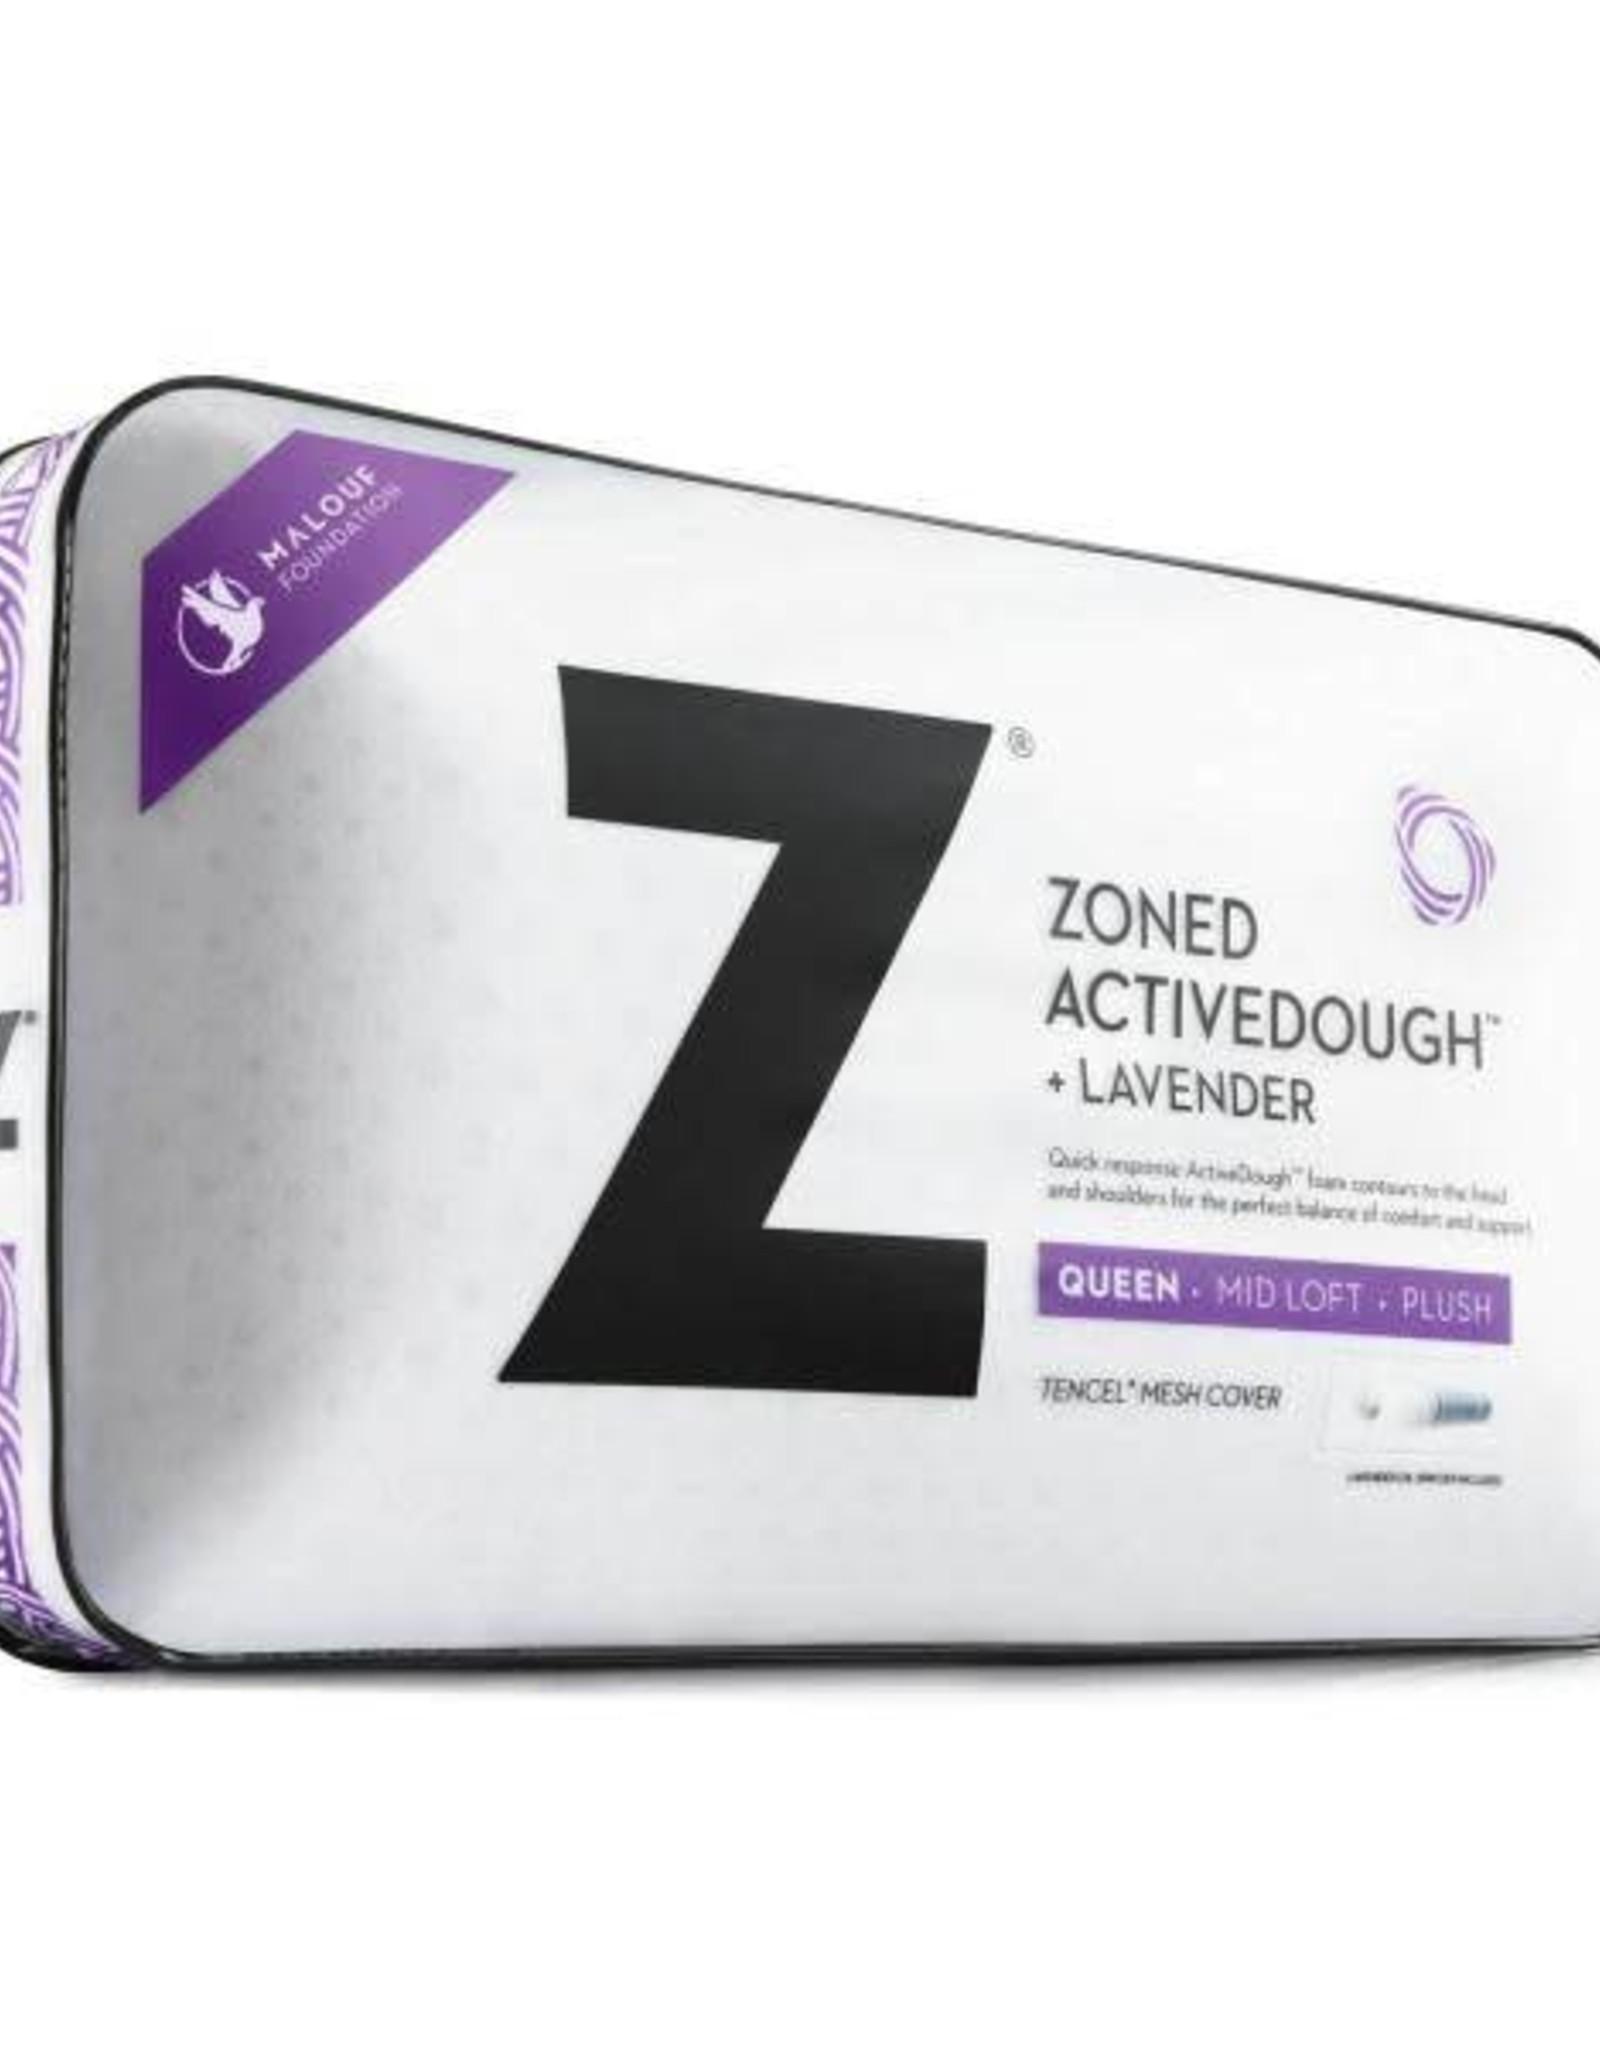 Malouf Z Zoned ActiveDough Lavender Pillow w/ Aromatherapy Spray - Mid Loft